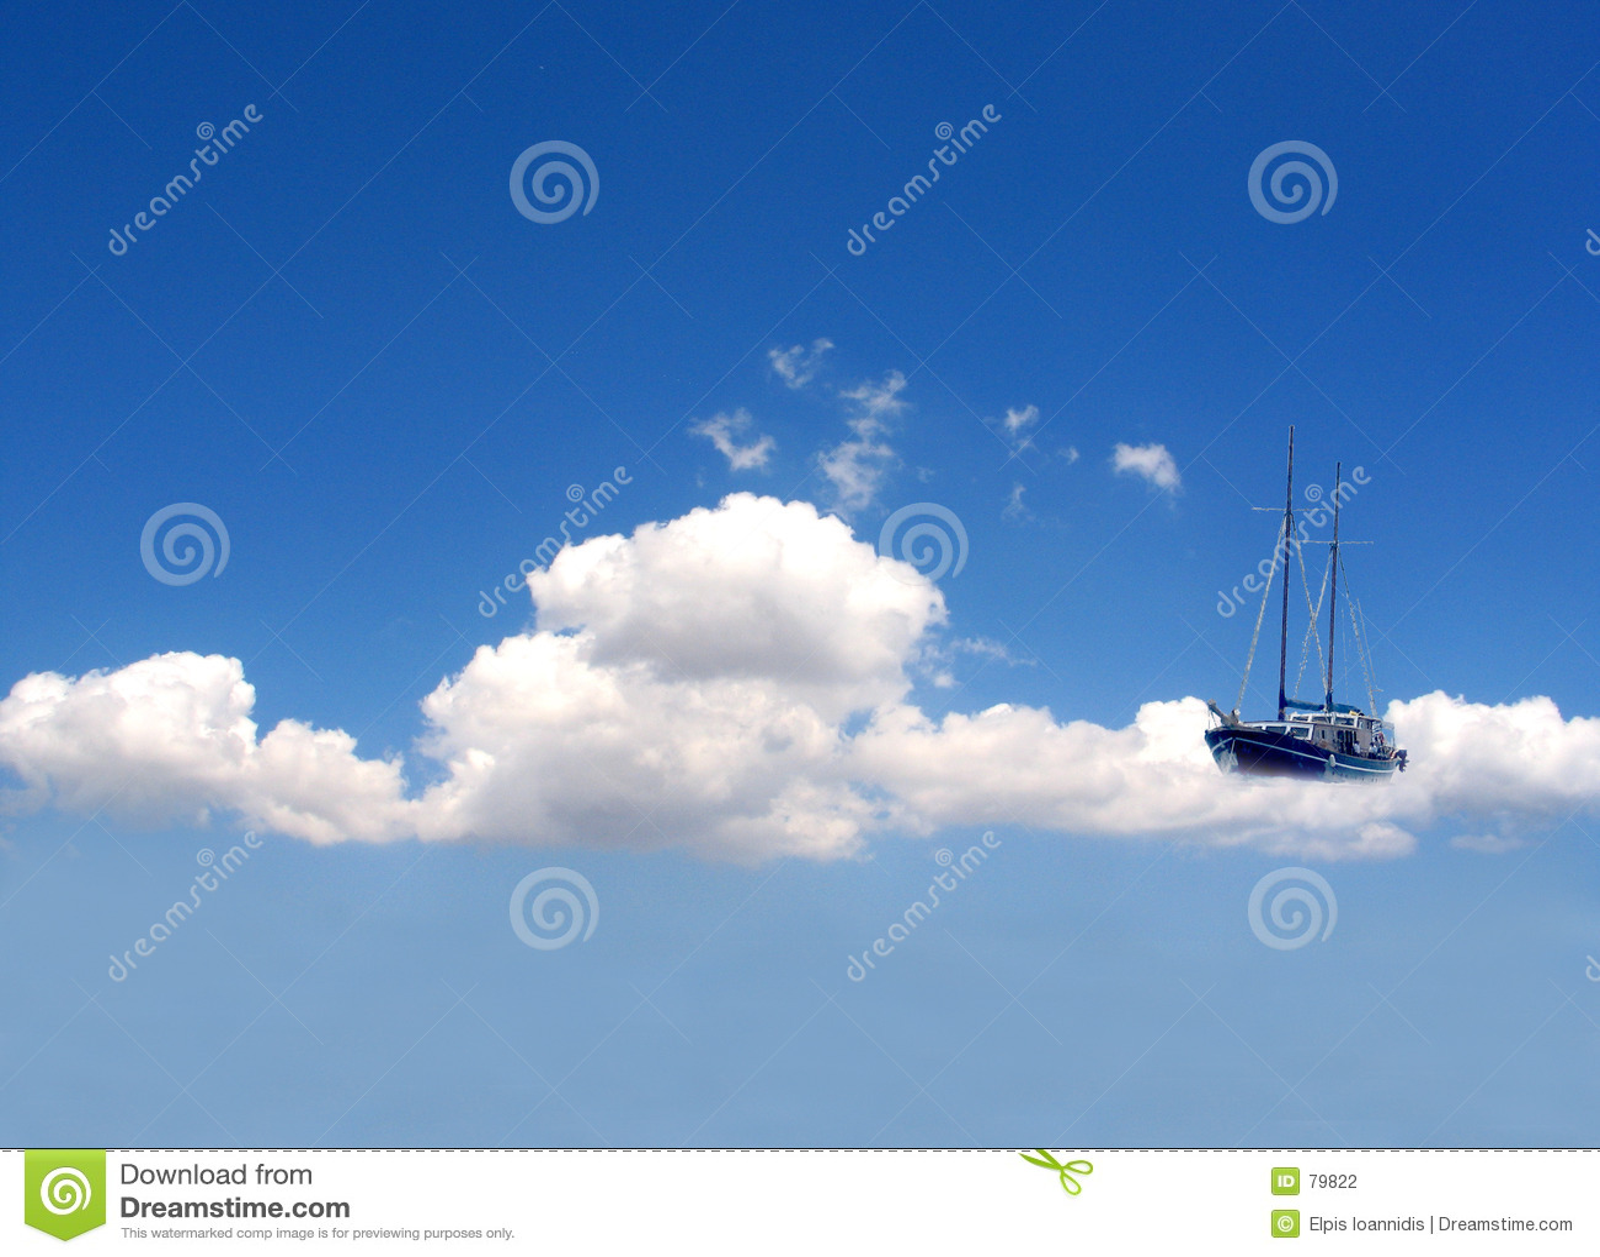 łódź marzycielska